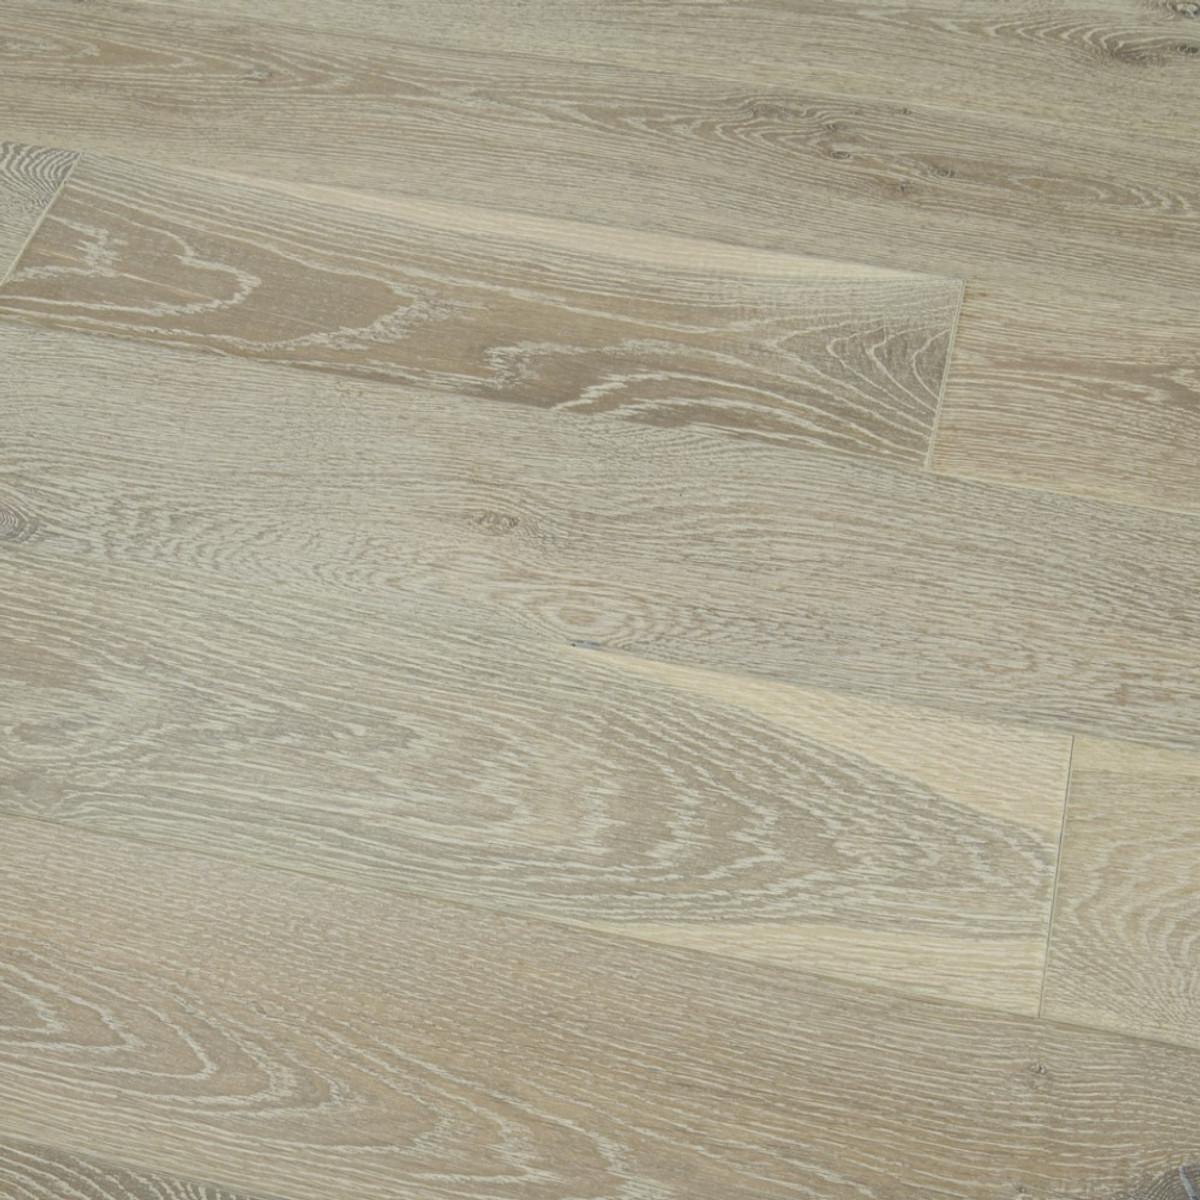 Tuscany Tudor Oak Smoked Brushed and White Oiled Engineered Wood Flooring order instore or online today @ www.tuscanytiles.co.uk